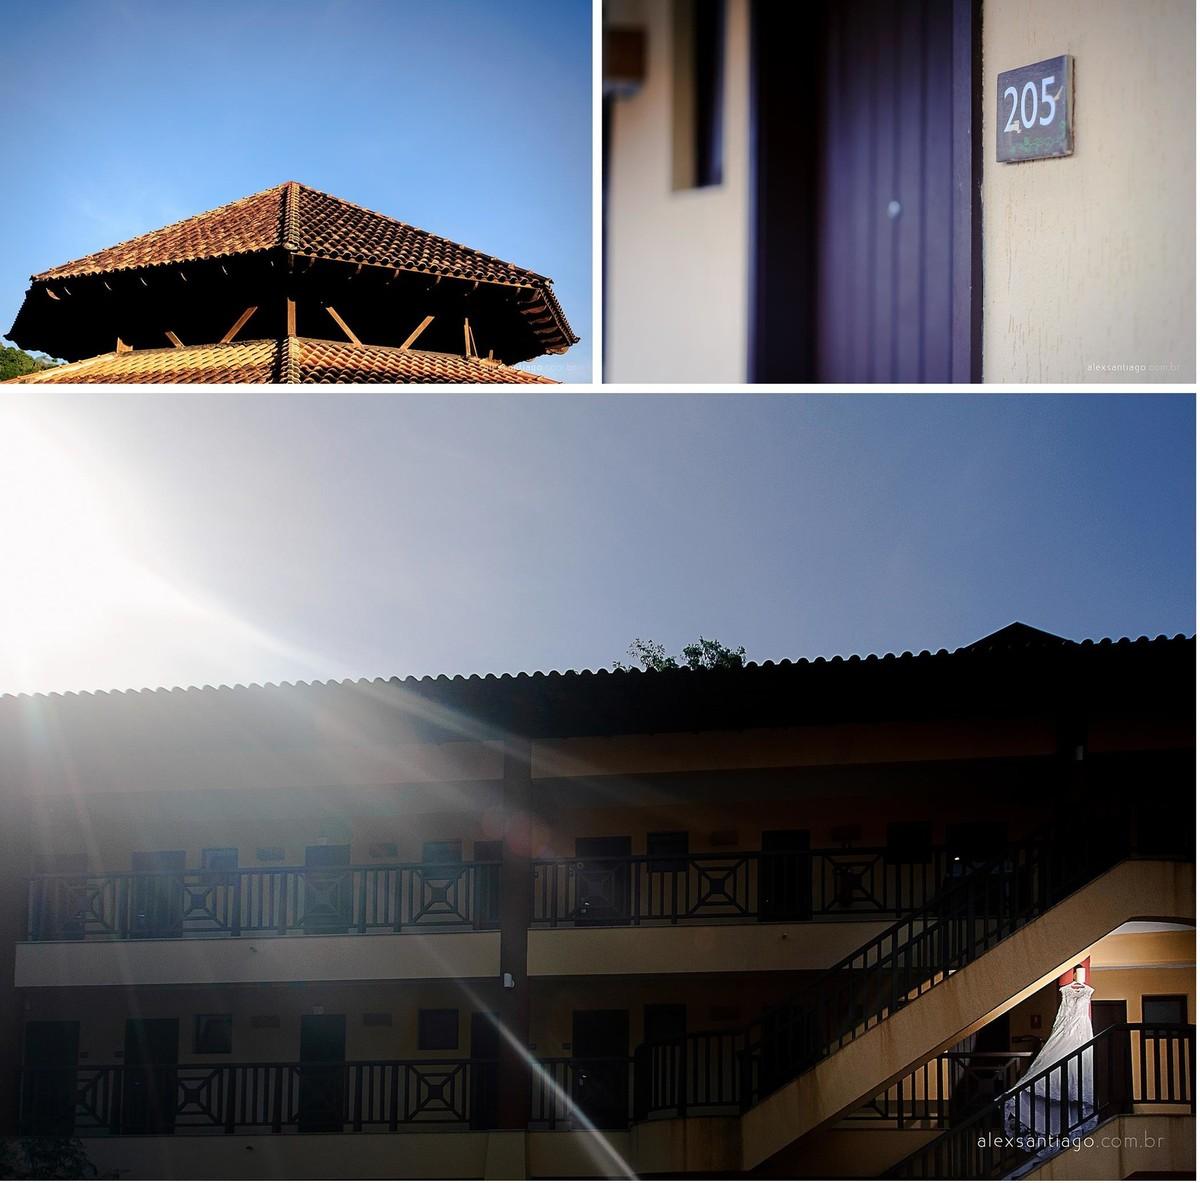 hotel Promenade Angra dos Reis, making of noiva angra dos reis, lugares para casar em angra dos reis, onde casar em angra dos reis, casamento promenade